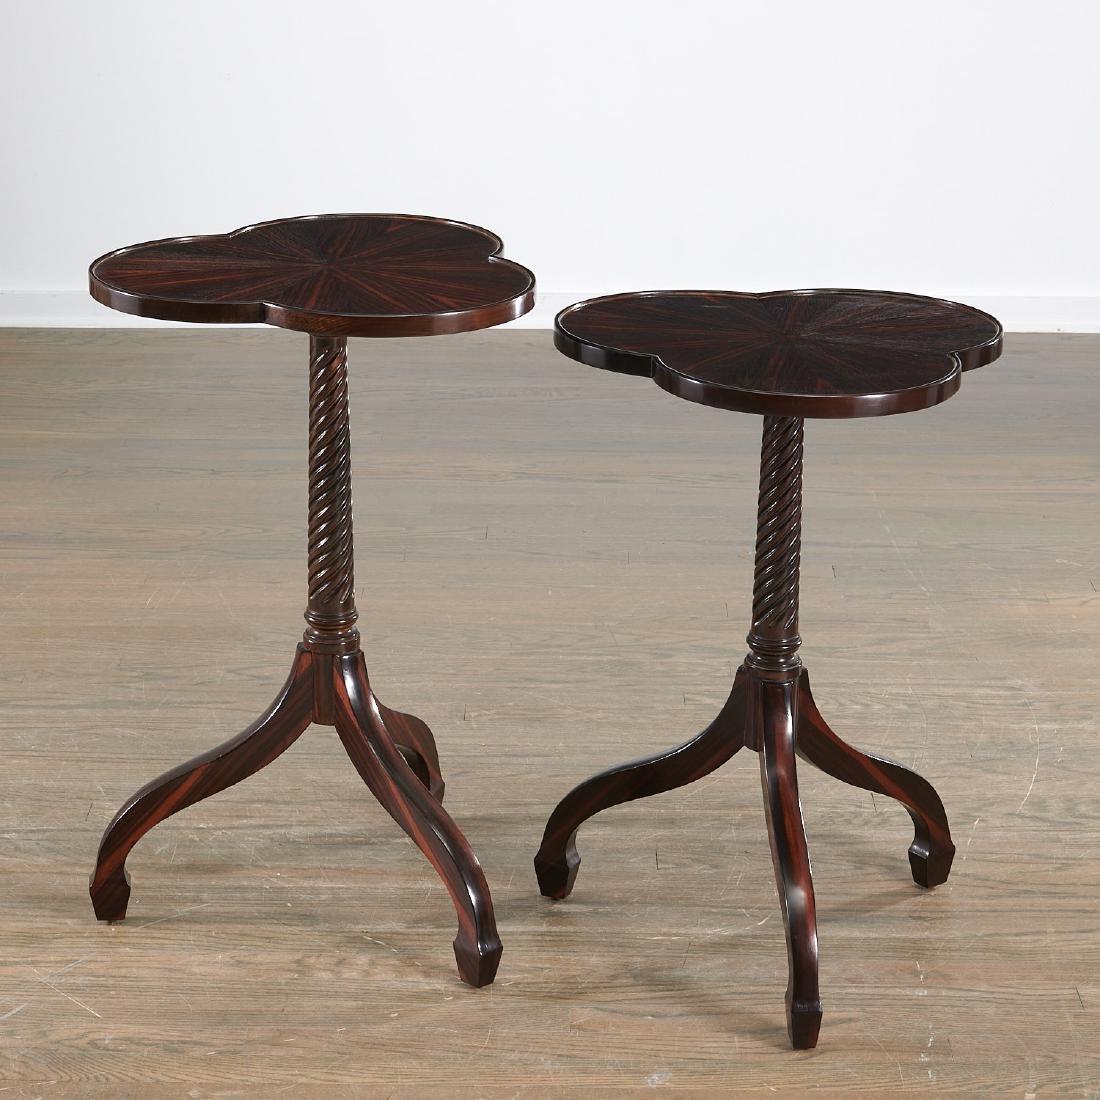 Ebony furniture